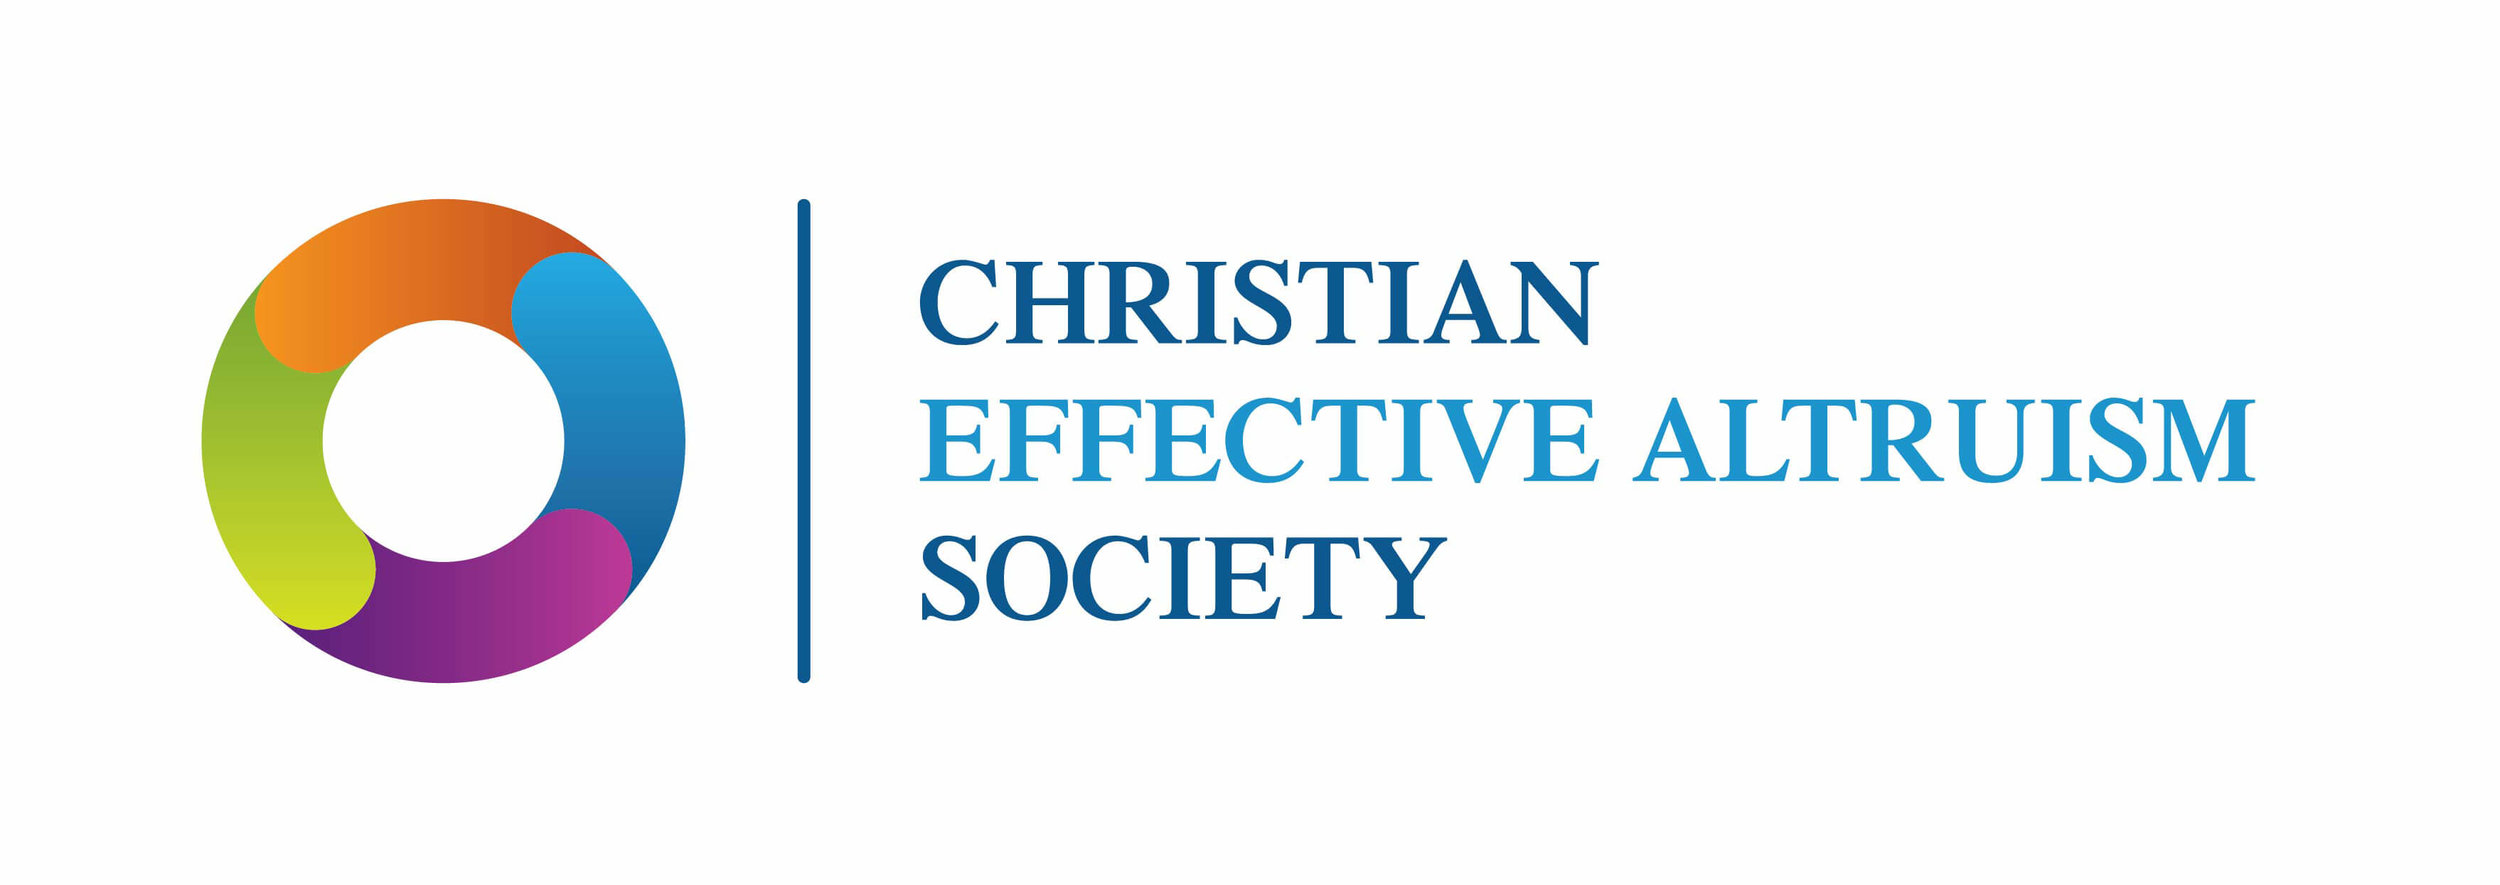 Christian Effective Altruism Society